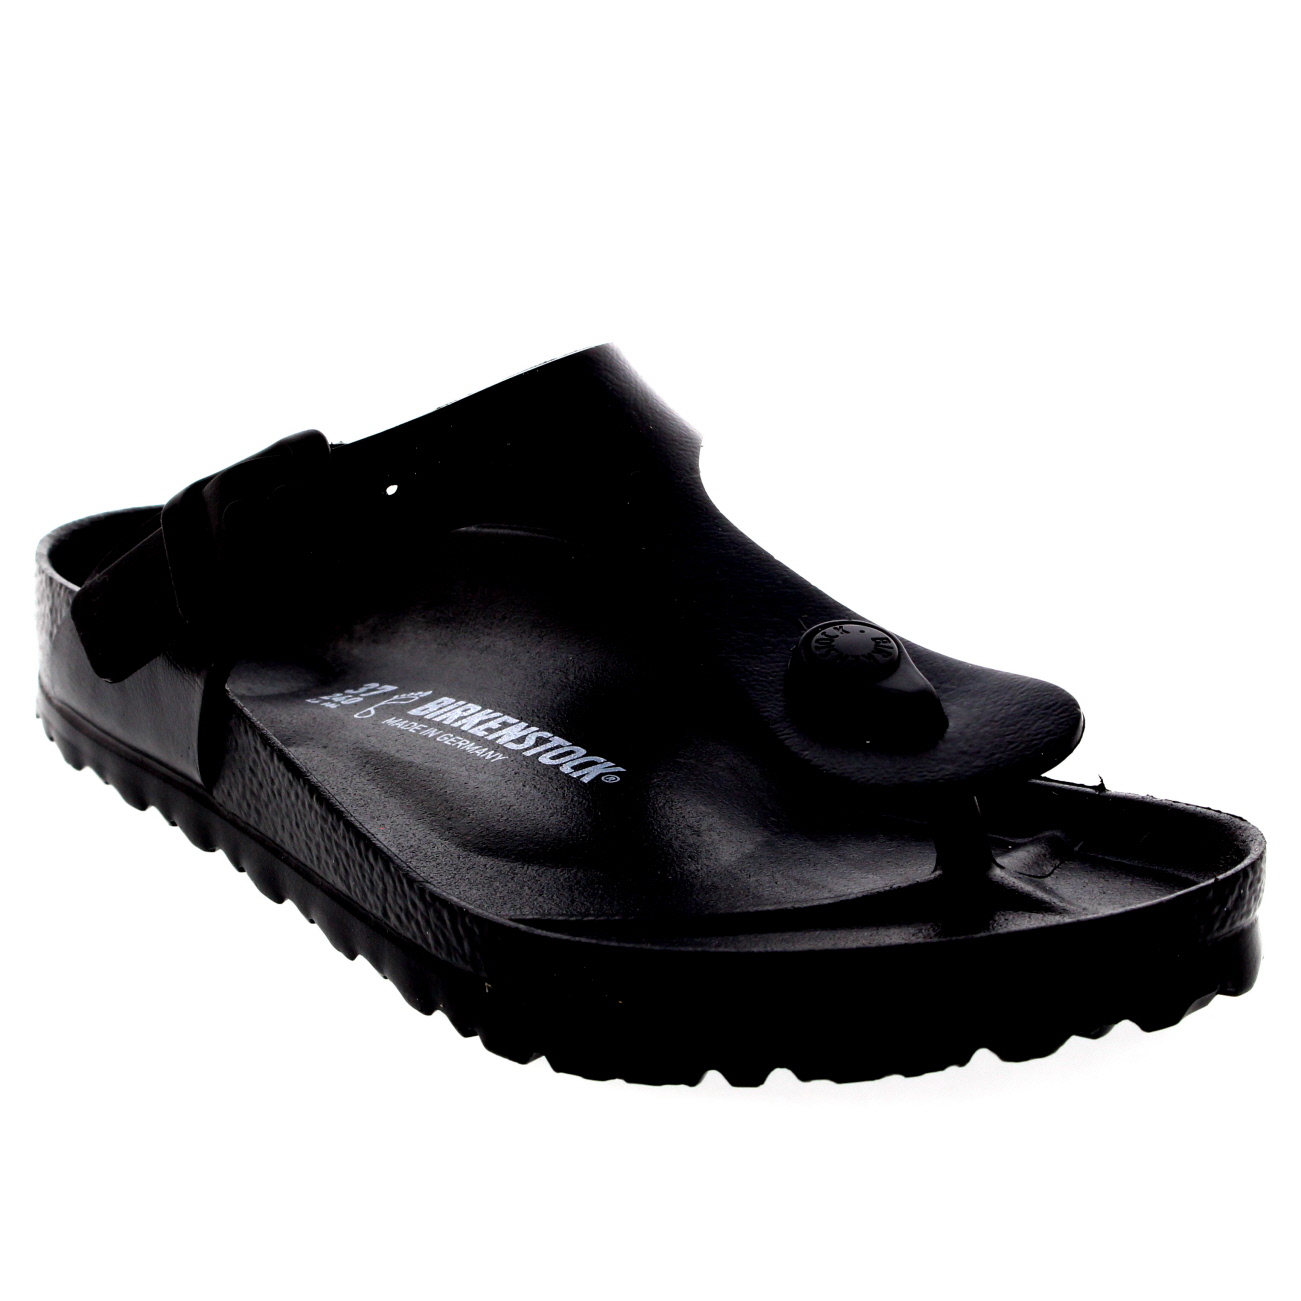 Unisex Birkenstock Gizeh Sandals